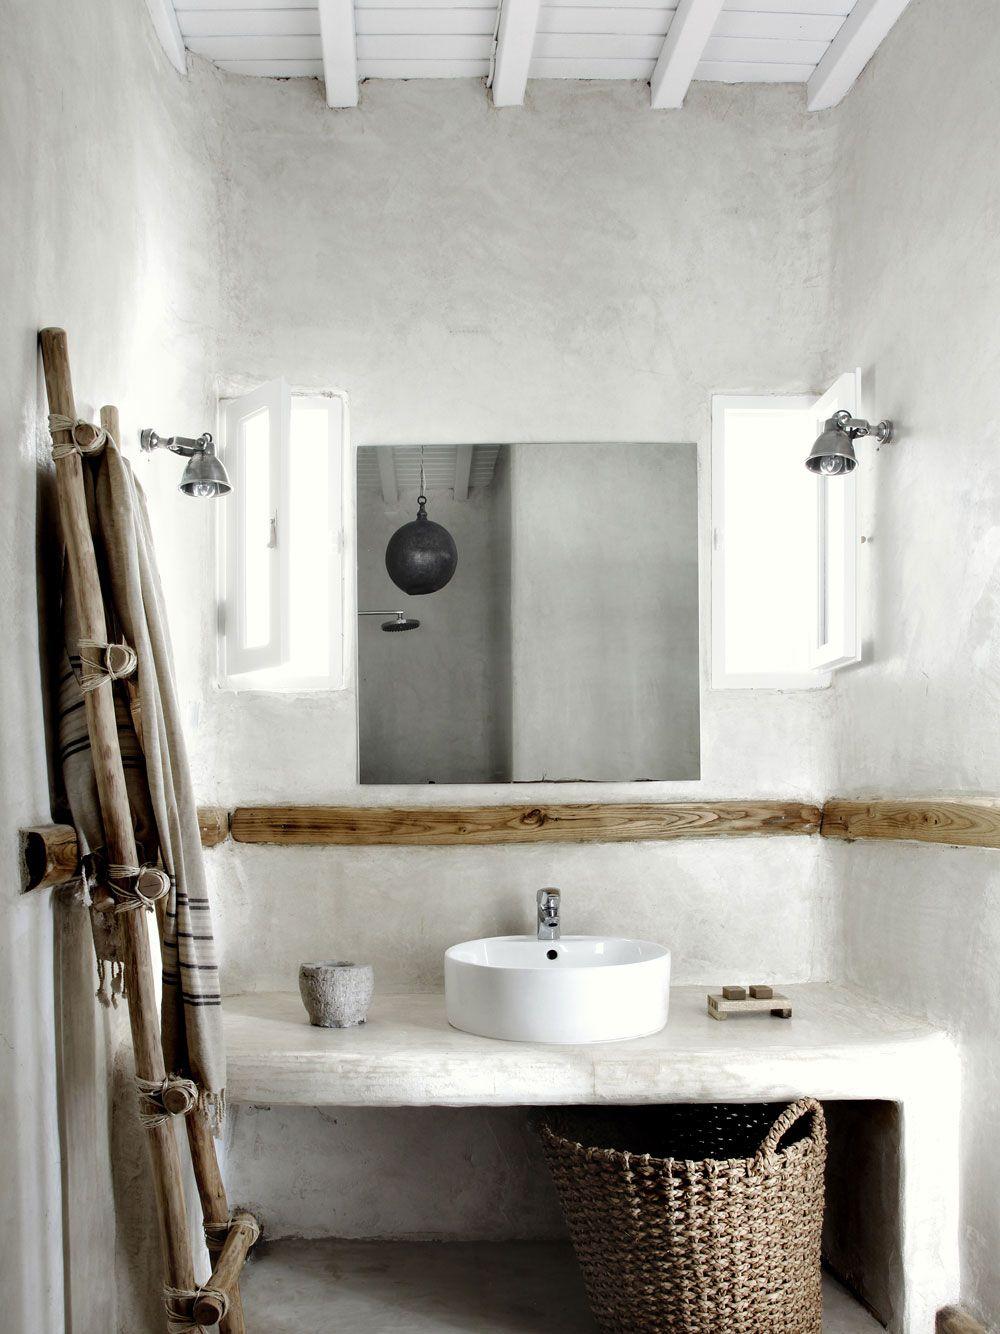 Ba o r stico encimera de obra para lavabo de dise o suelo microcemento ba os modernos - Lavabos de obra ...